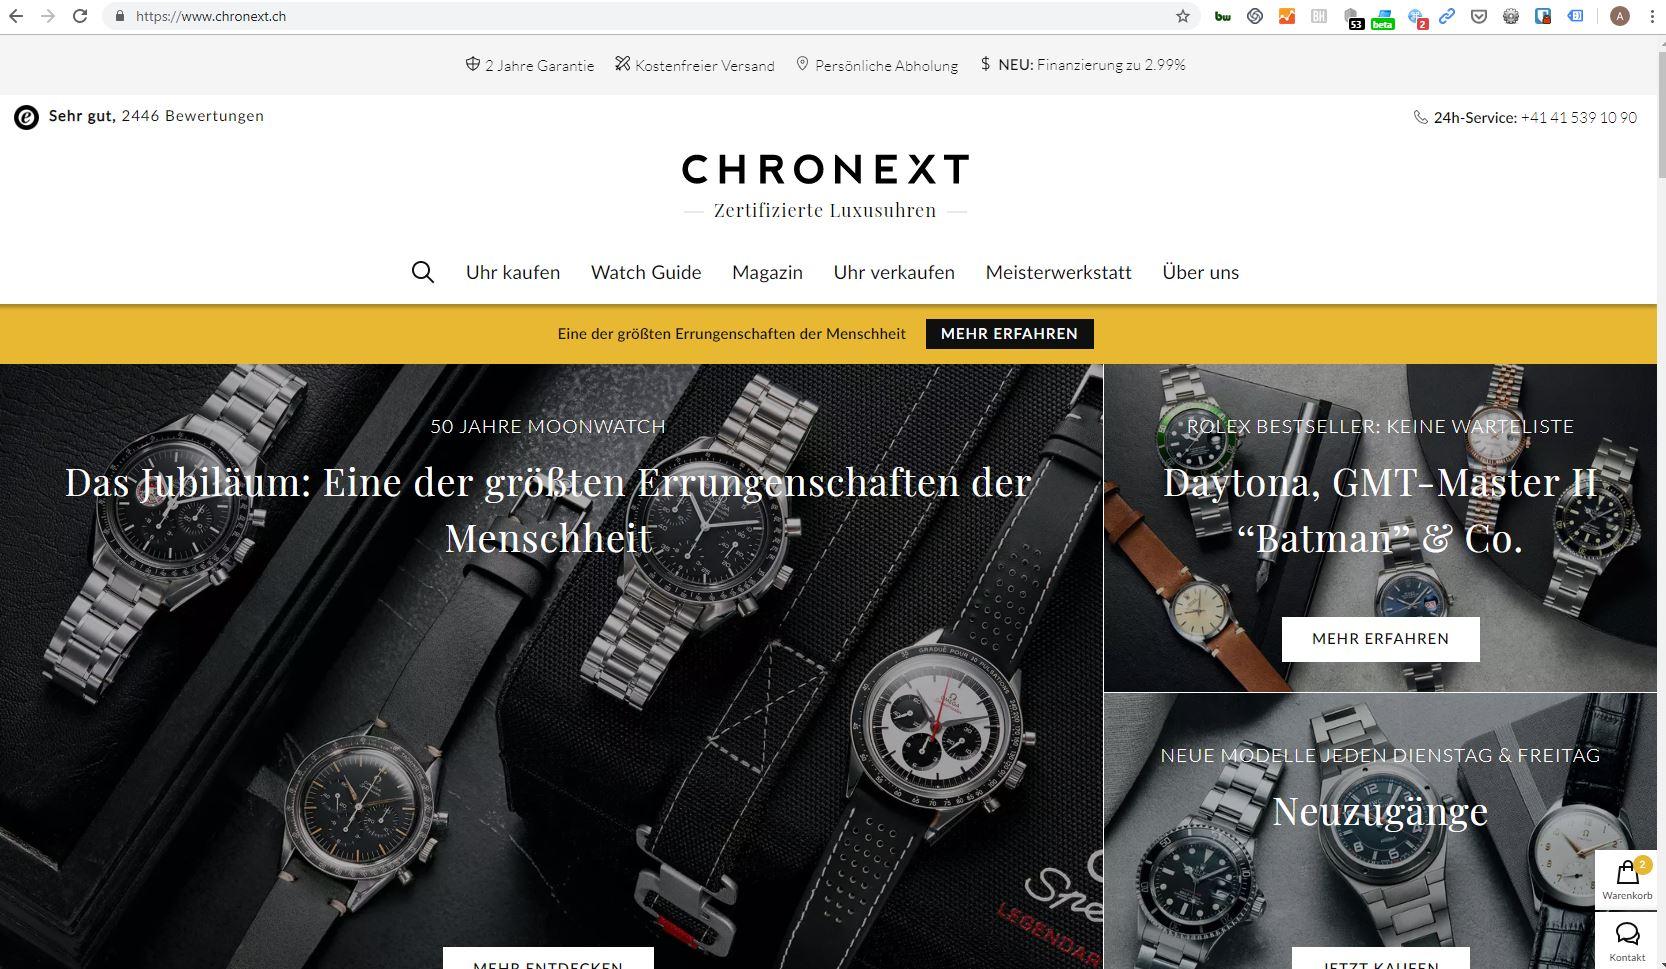 crhonext printscreen